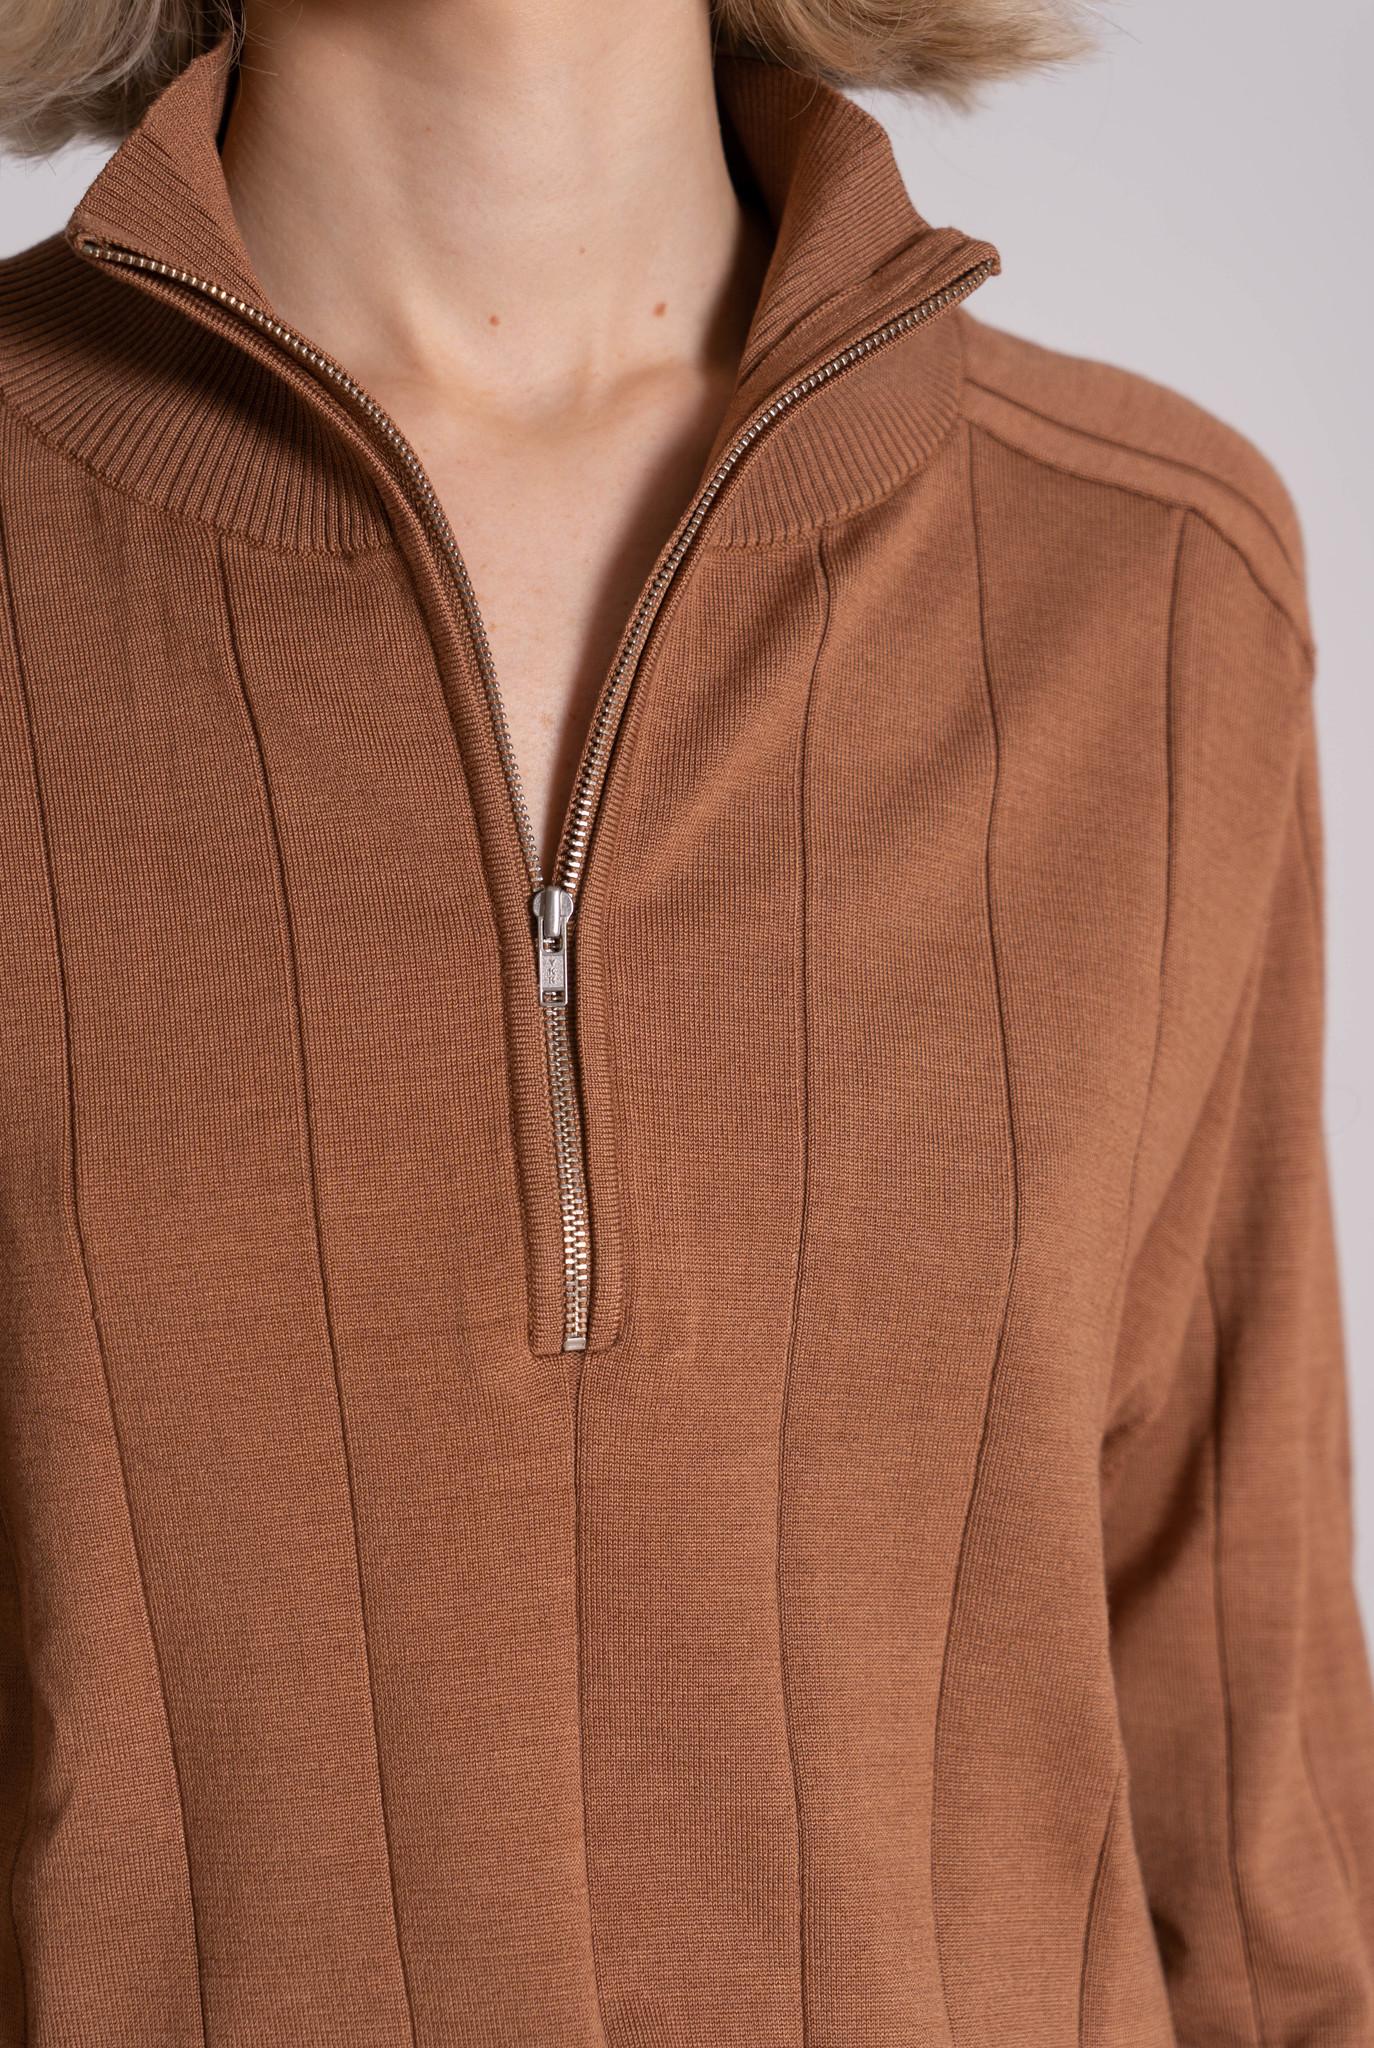 Octave Pullover Chestnut